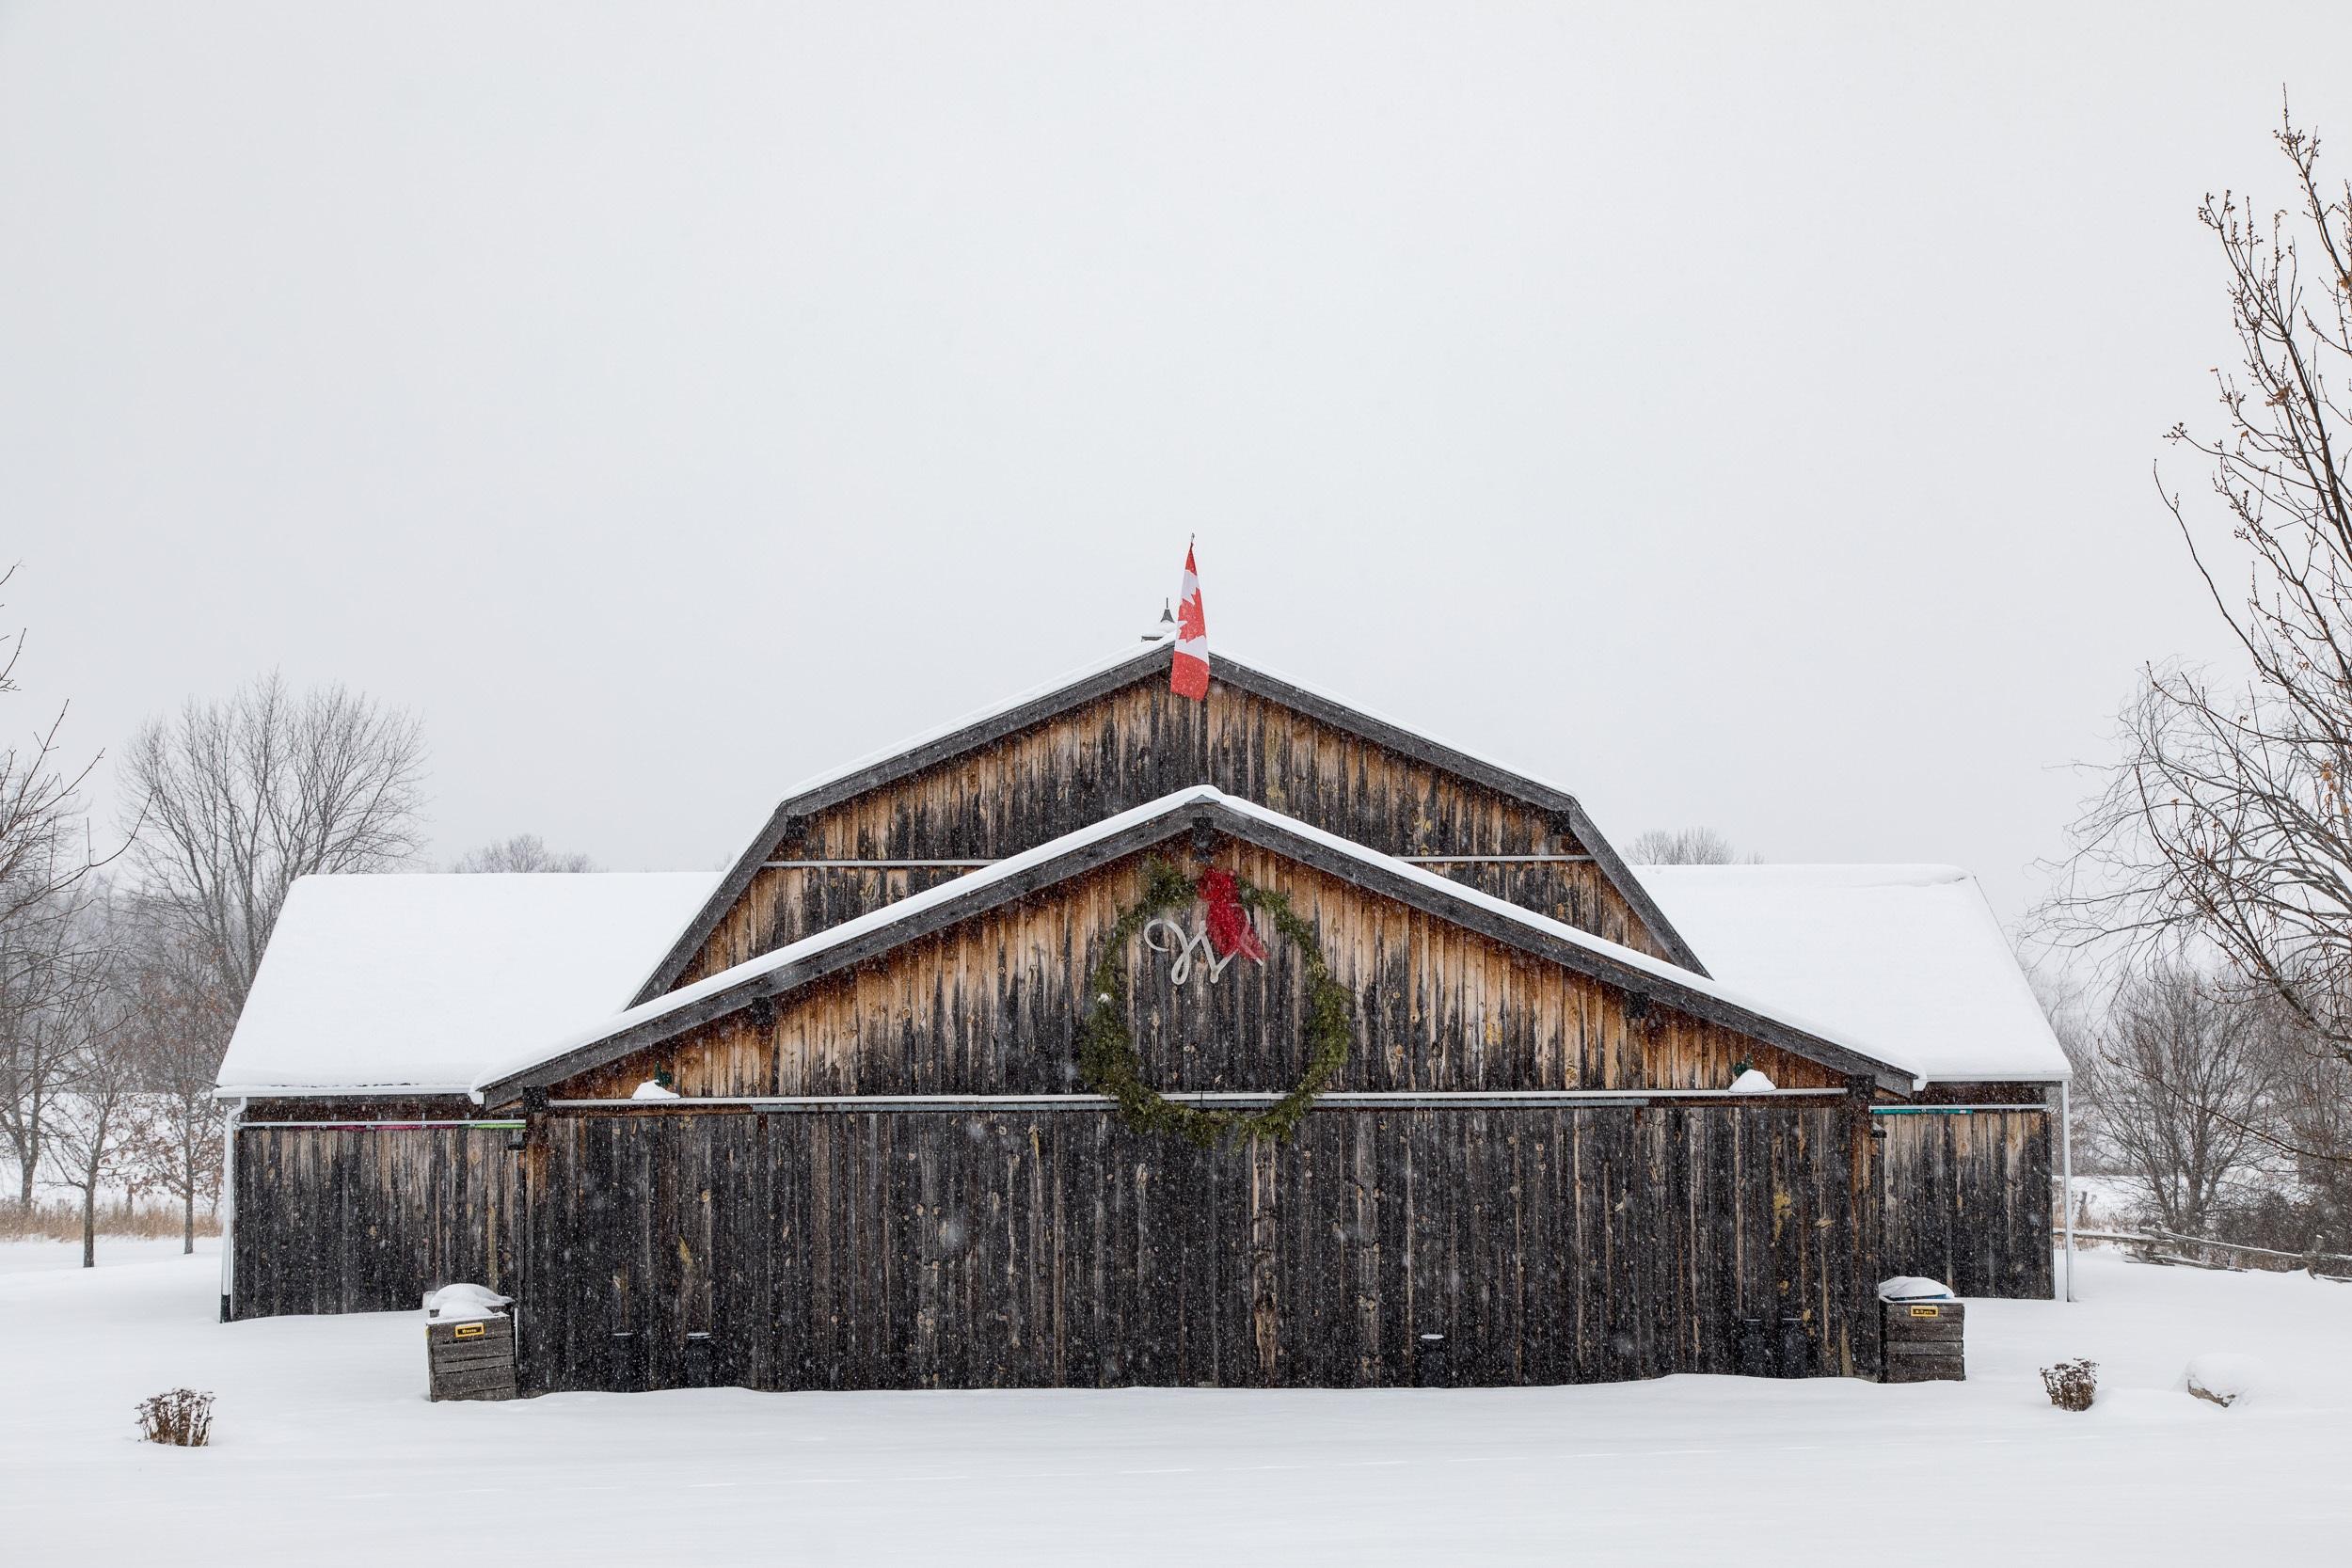 winterbarn-1 2018 Daag.jpg